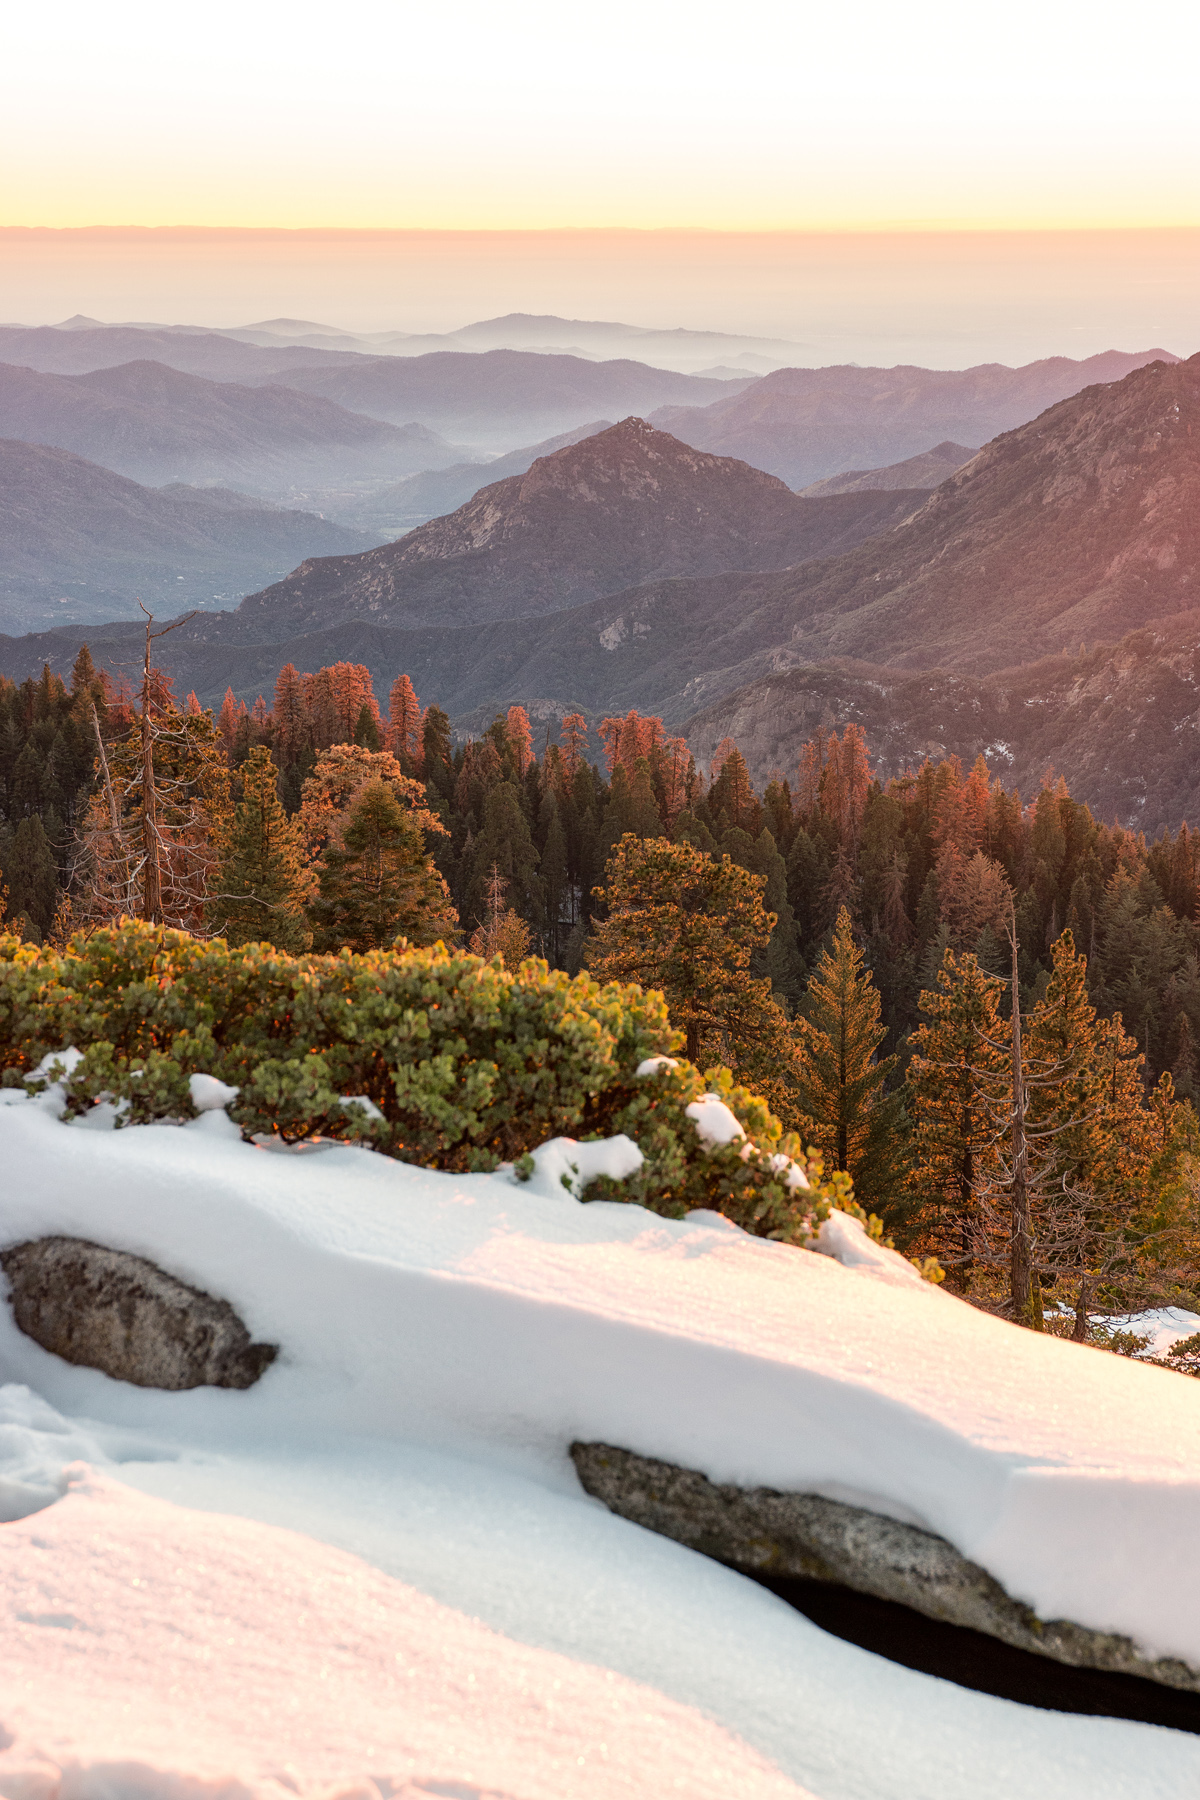 Wasim Muklashy Photography_Sequoia National Park_California_December 2015_-SAM_4188-Edit.jpg